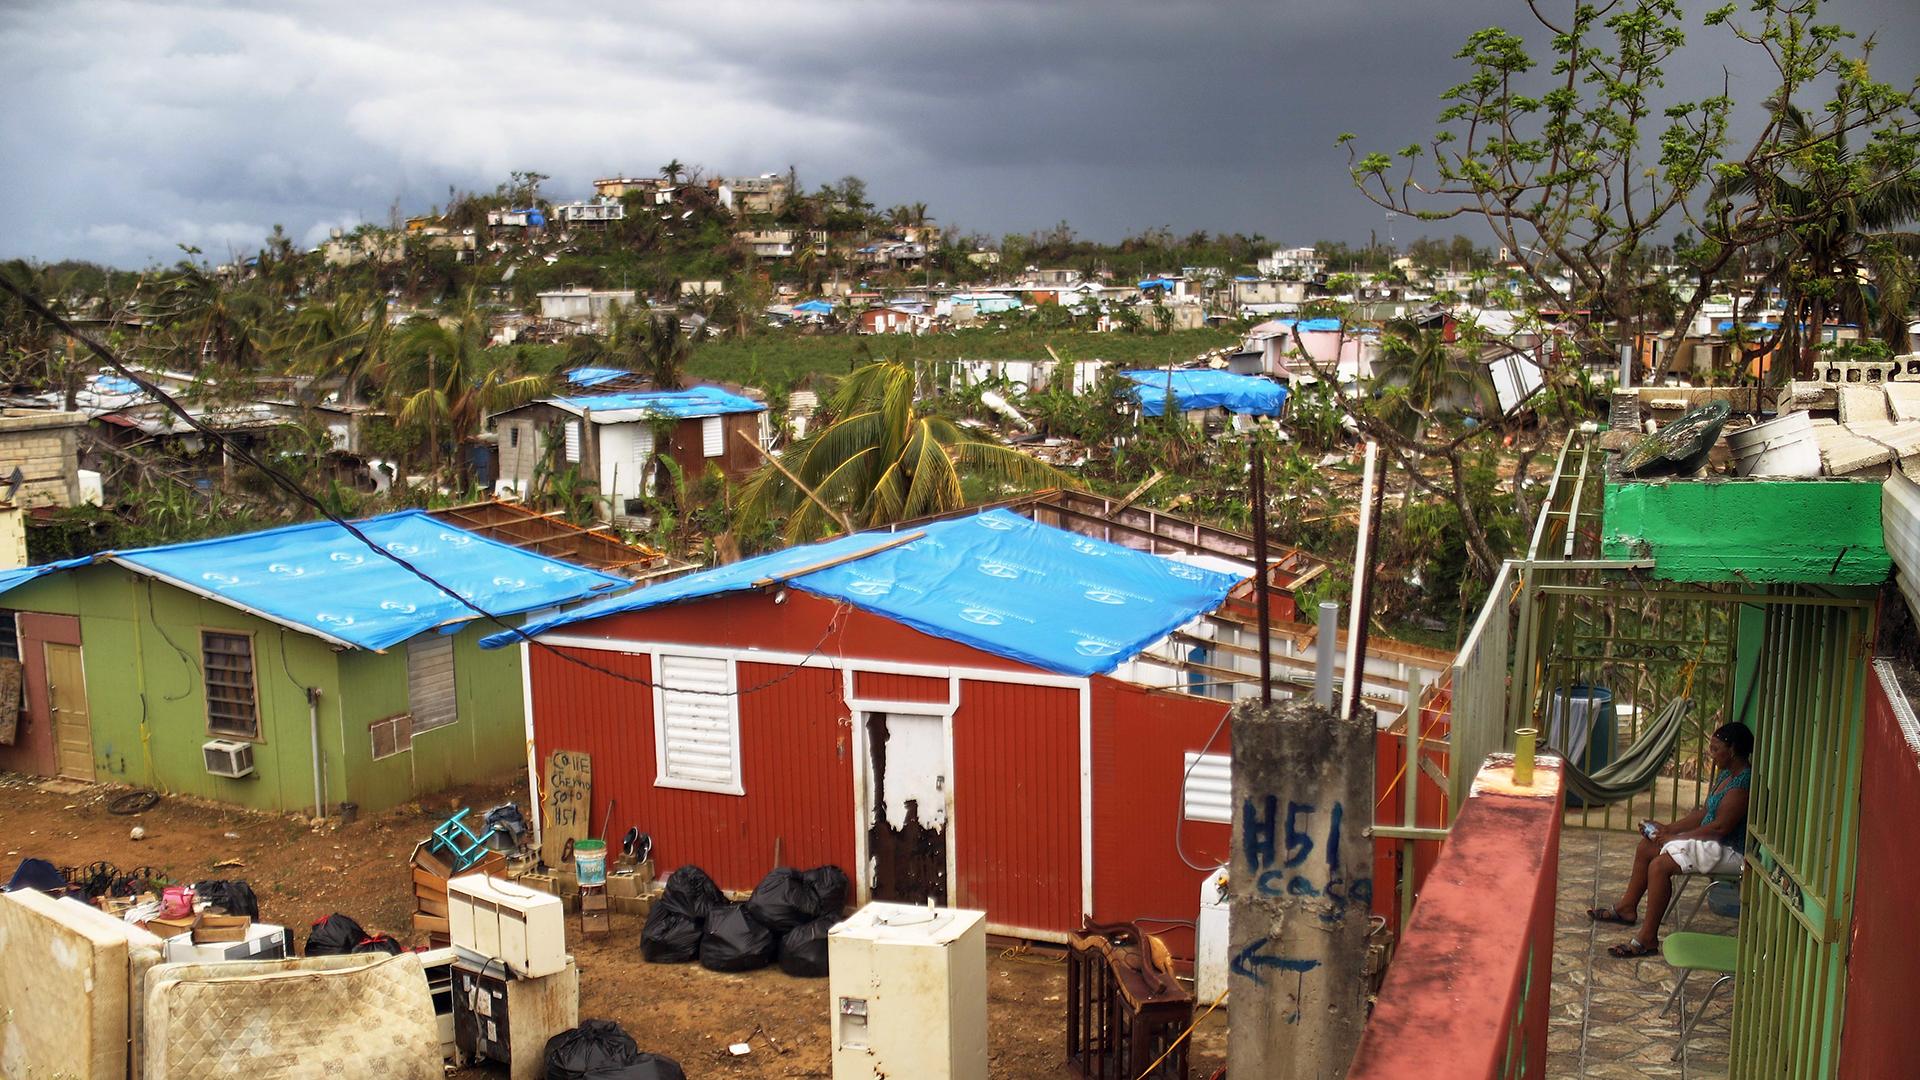 Hurricane damage in San Isidro Puerto Rico-159532.jpg24332117